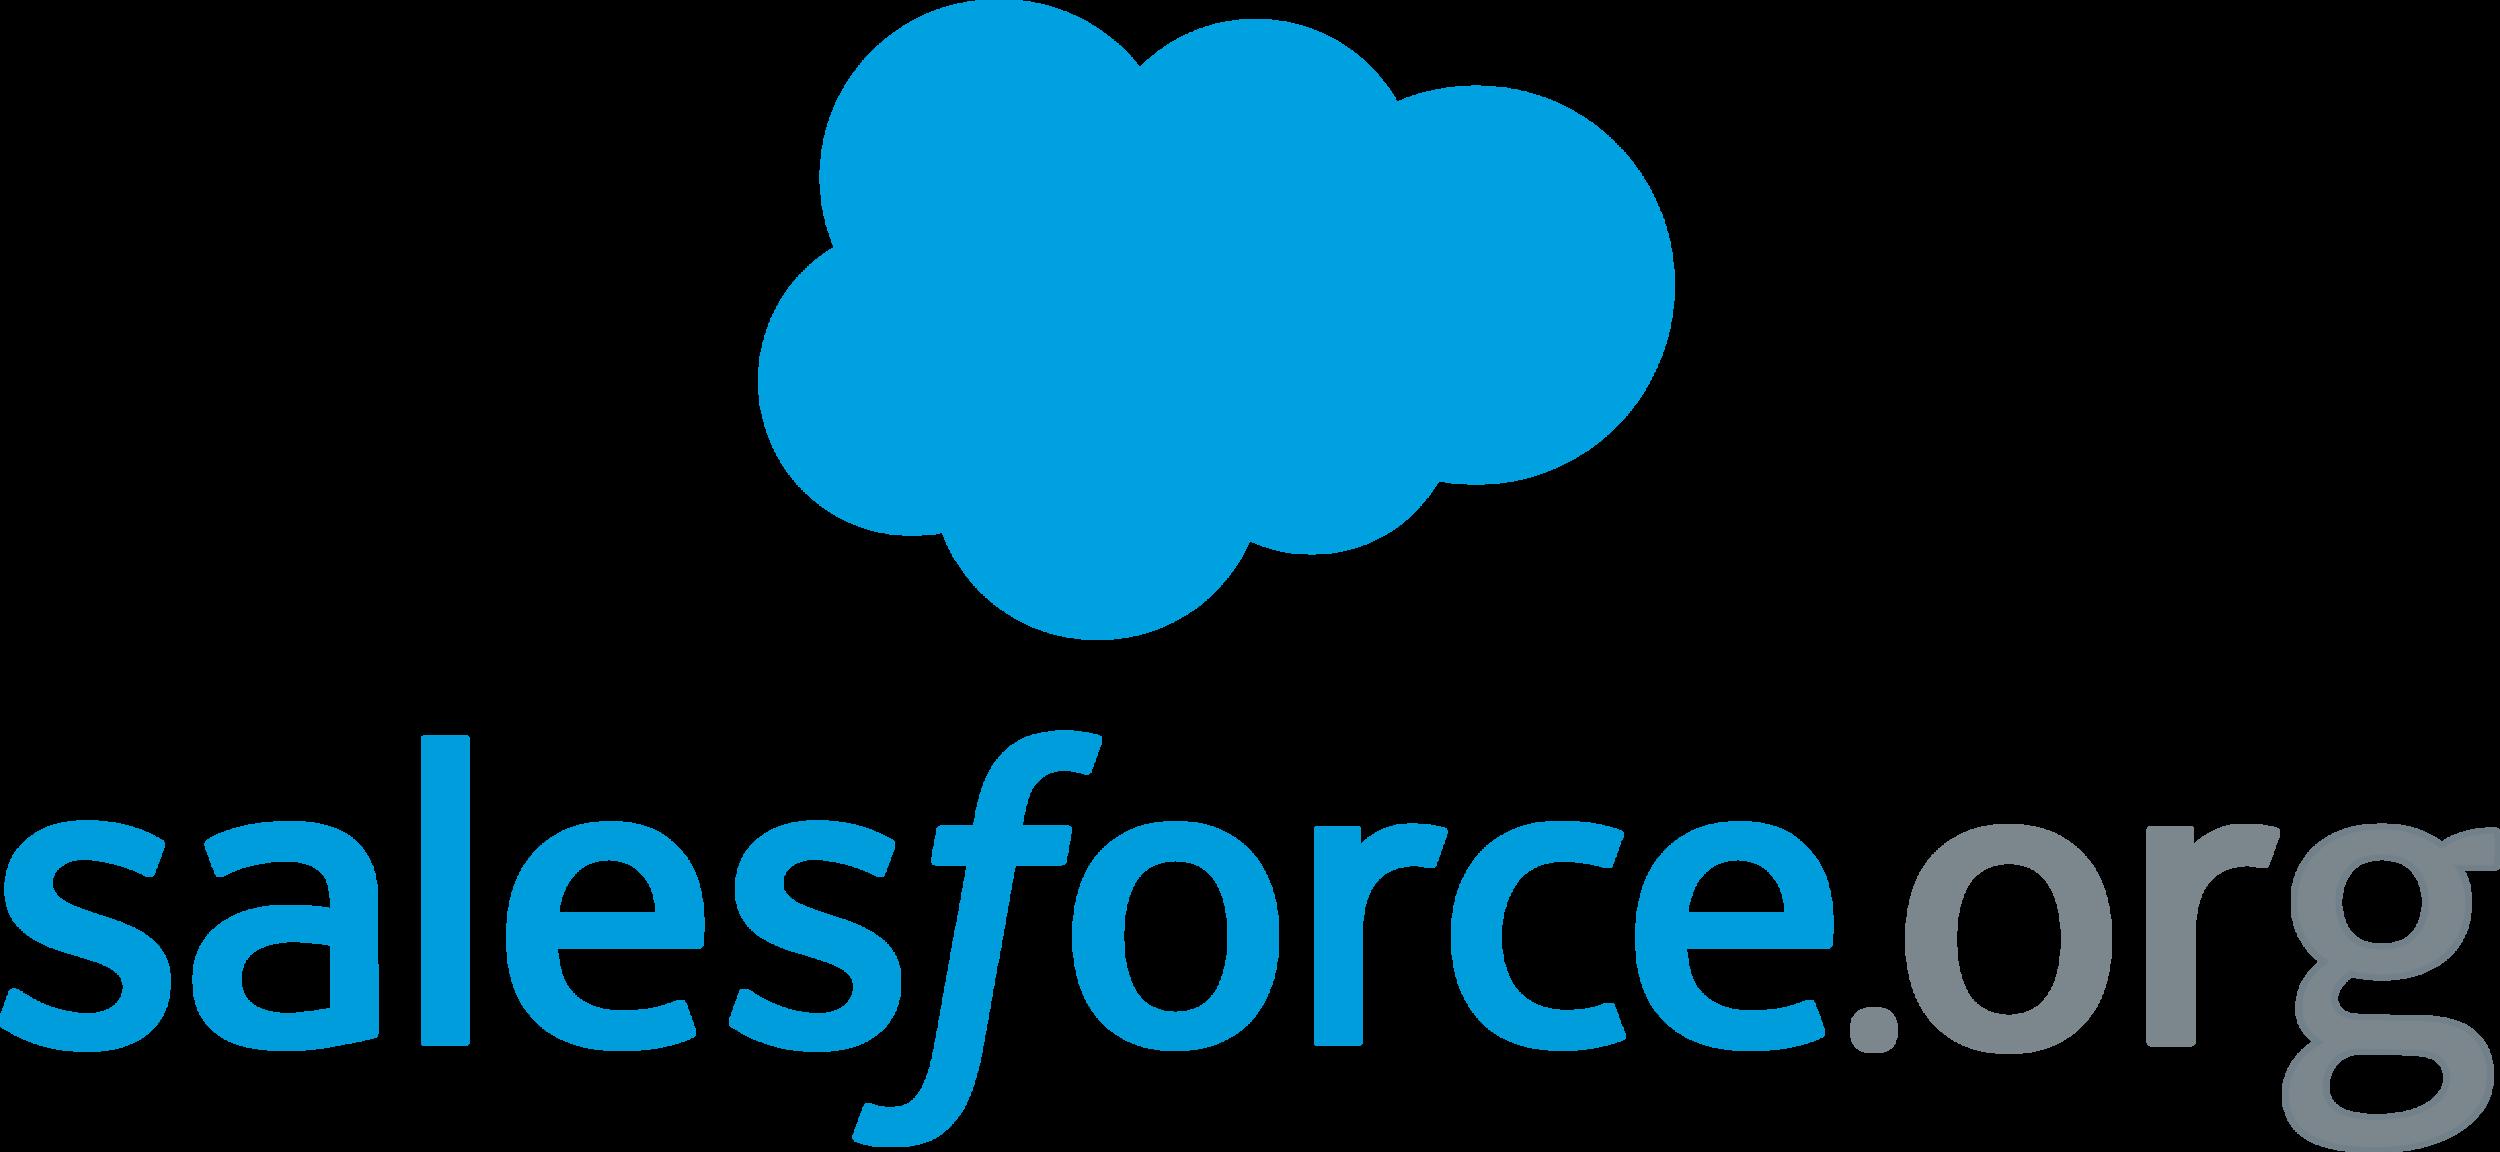 Salesforce org 2016.png